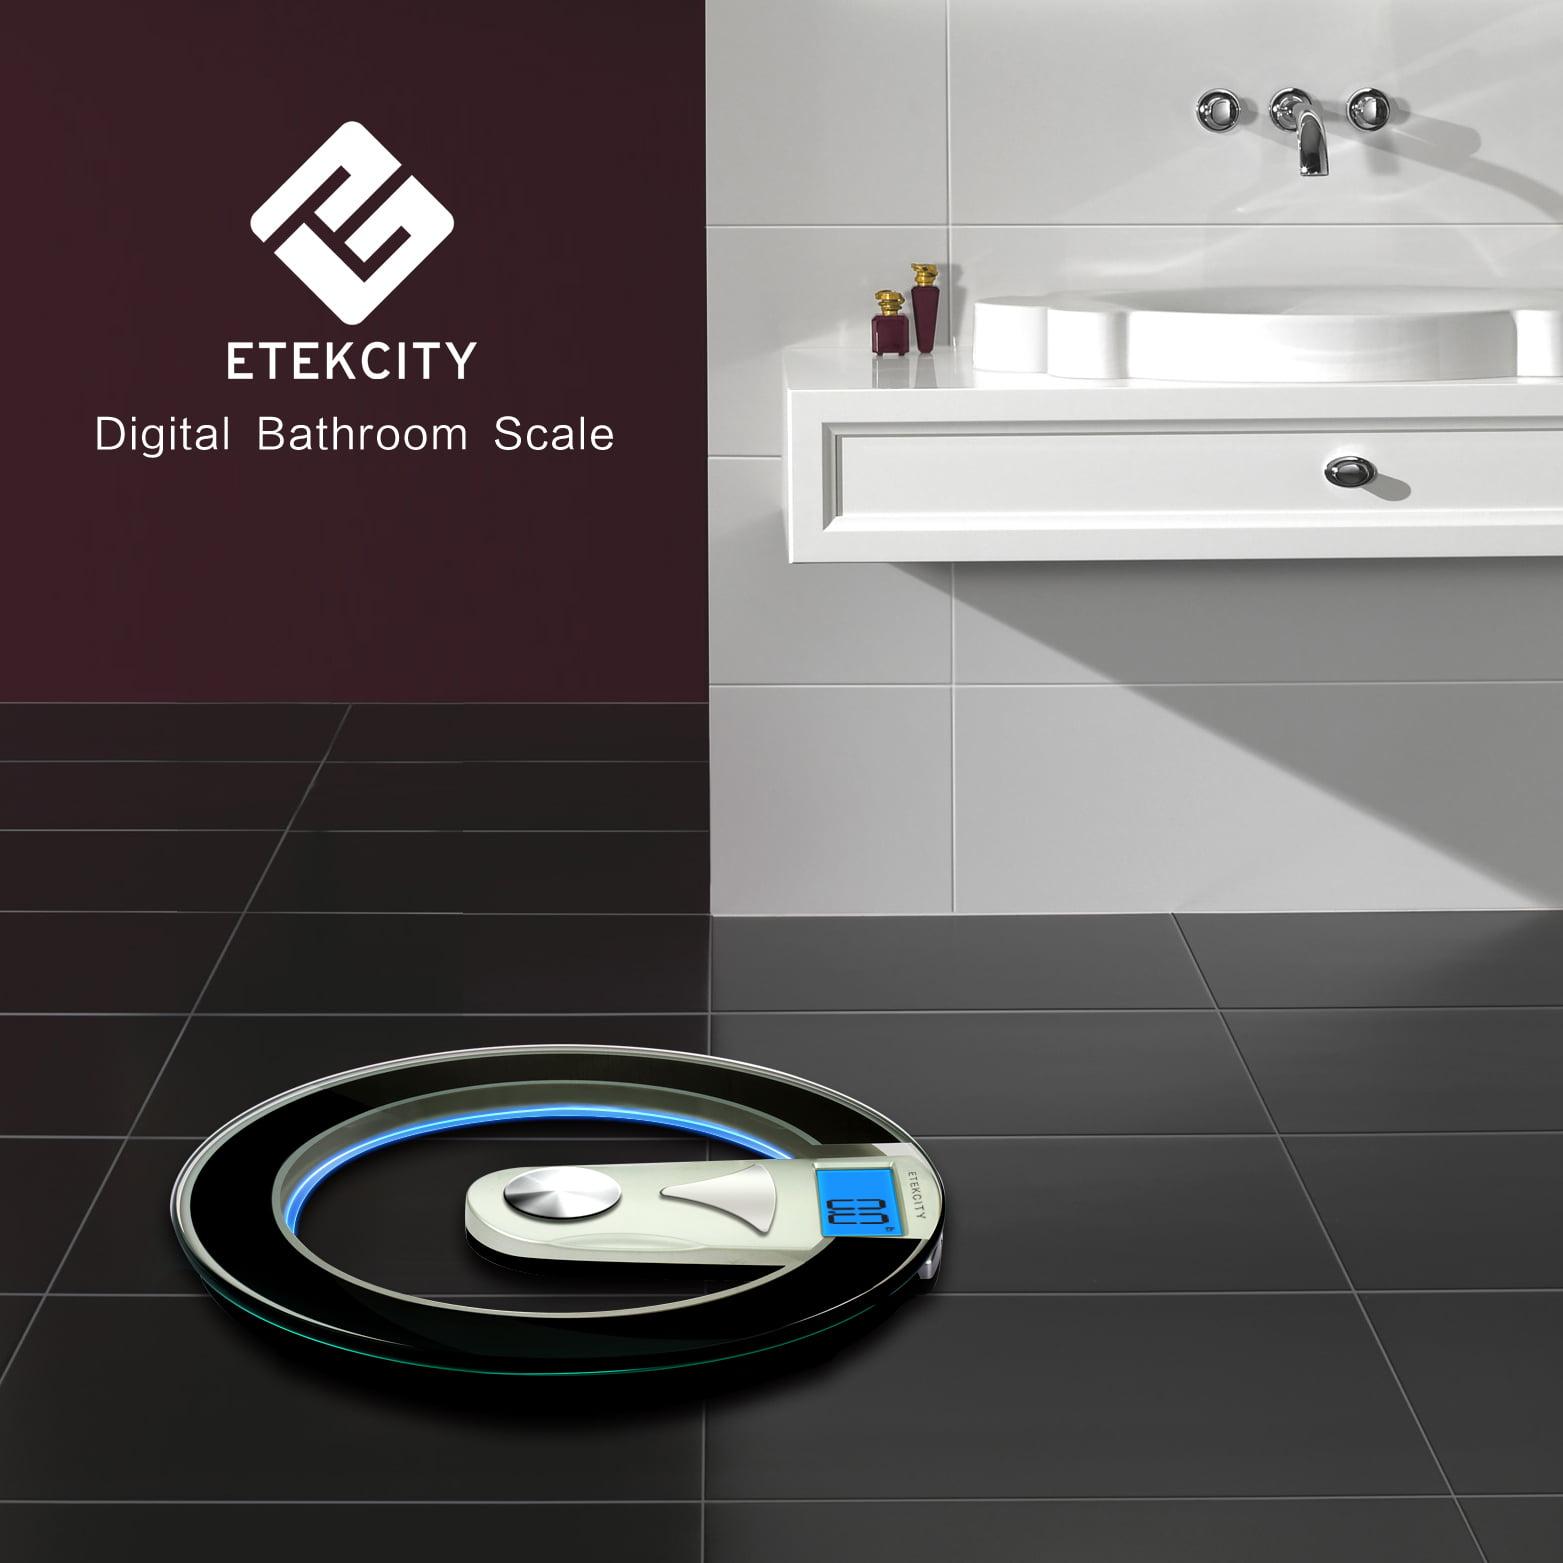 Etekcity Digital Bath Bathroom Body Weight Watcher Scale ...